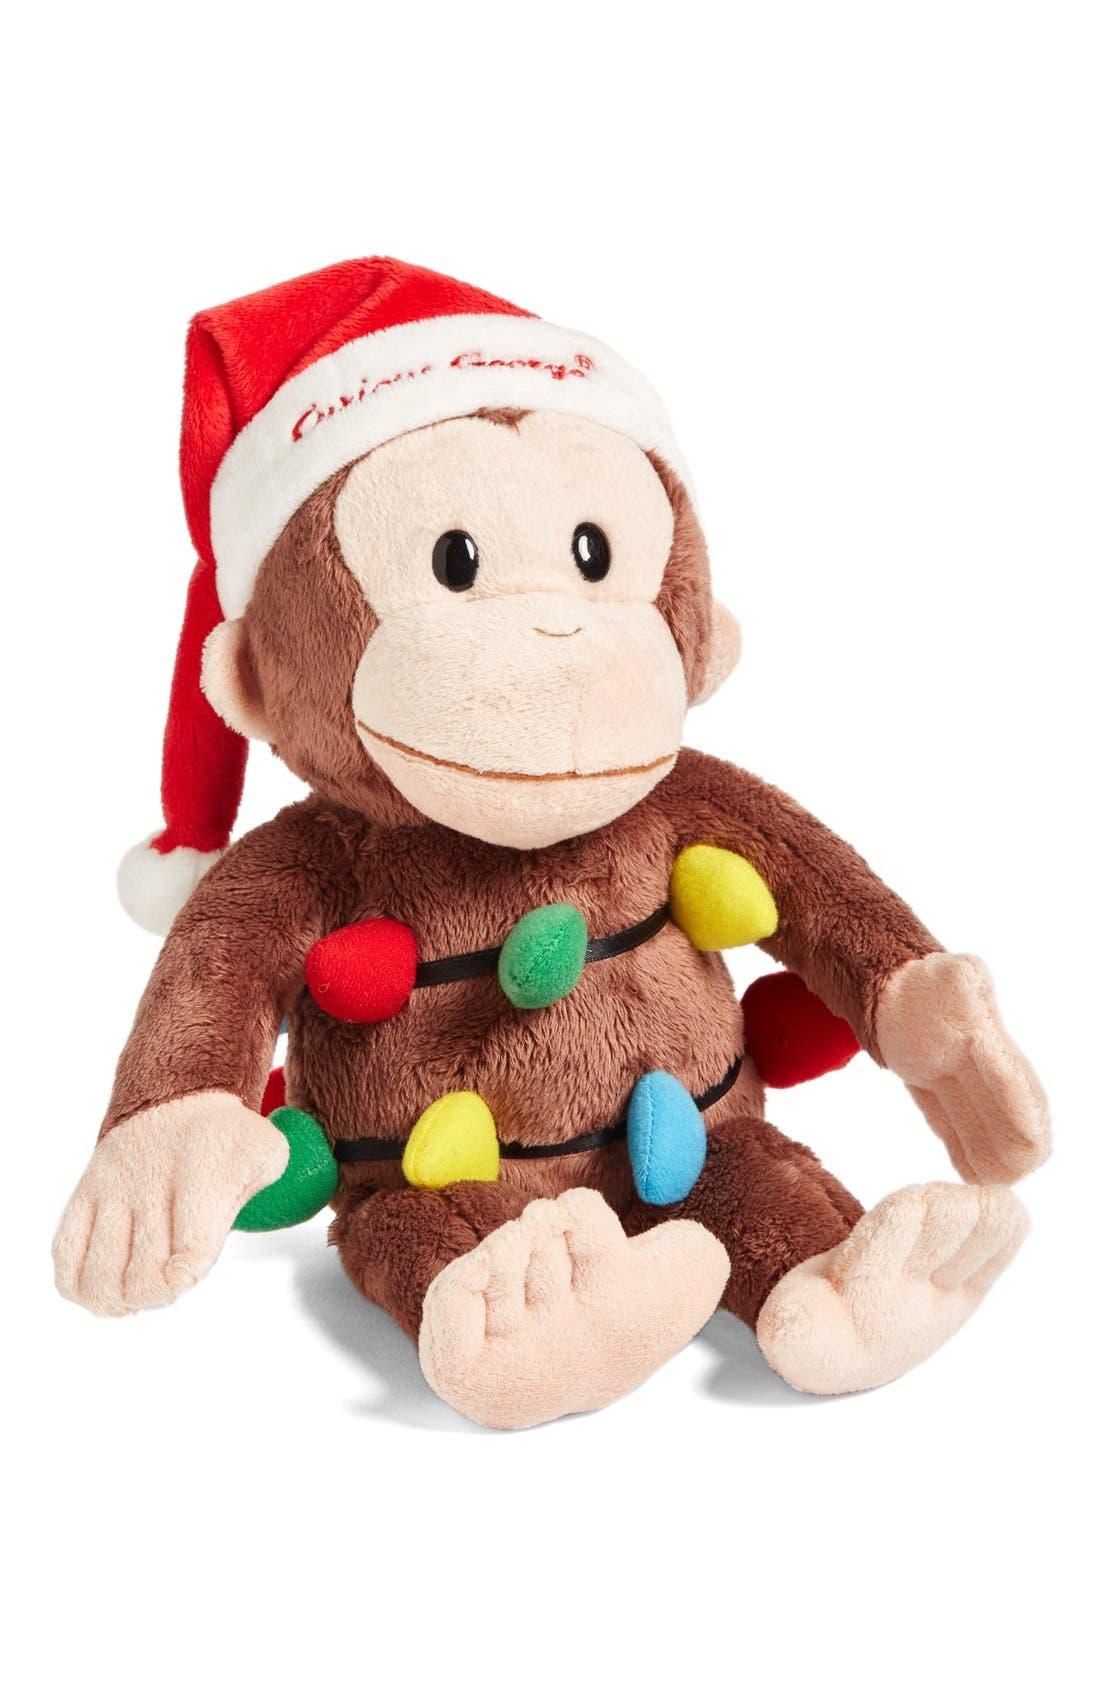 Main Image - Gund Curious George Holiday Stuffed Animal